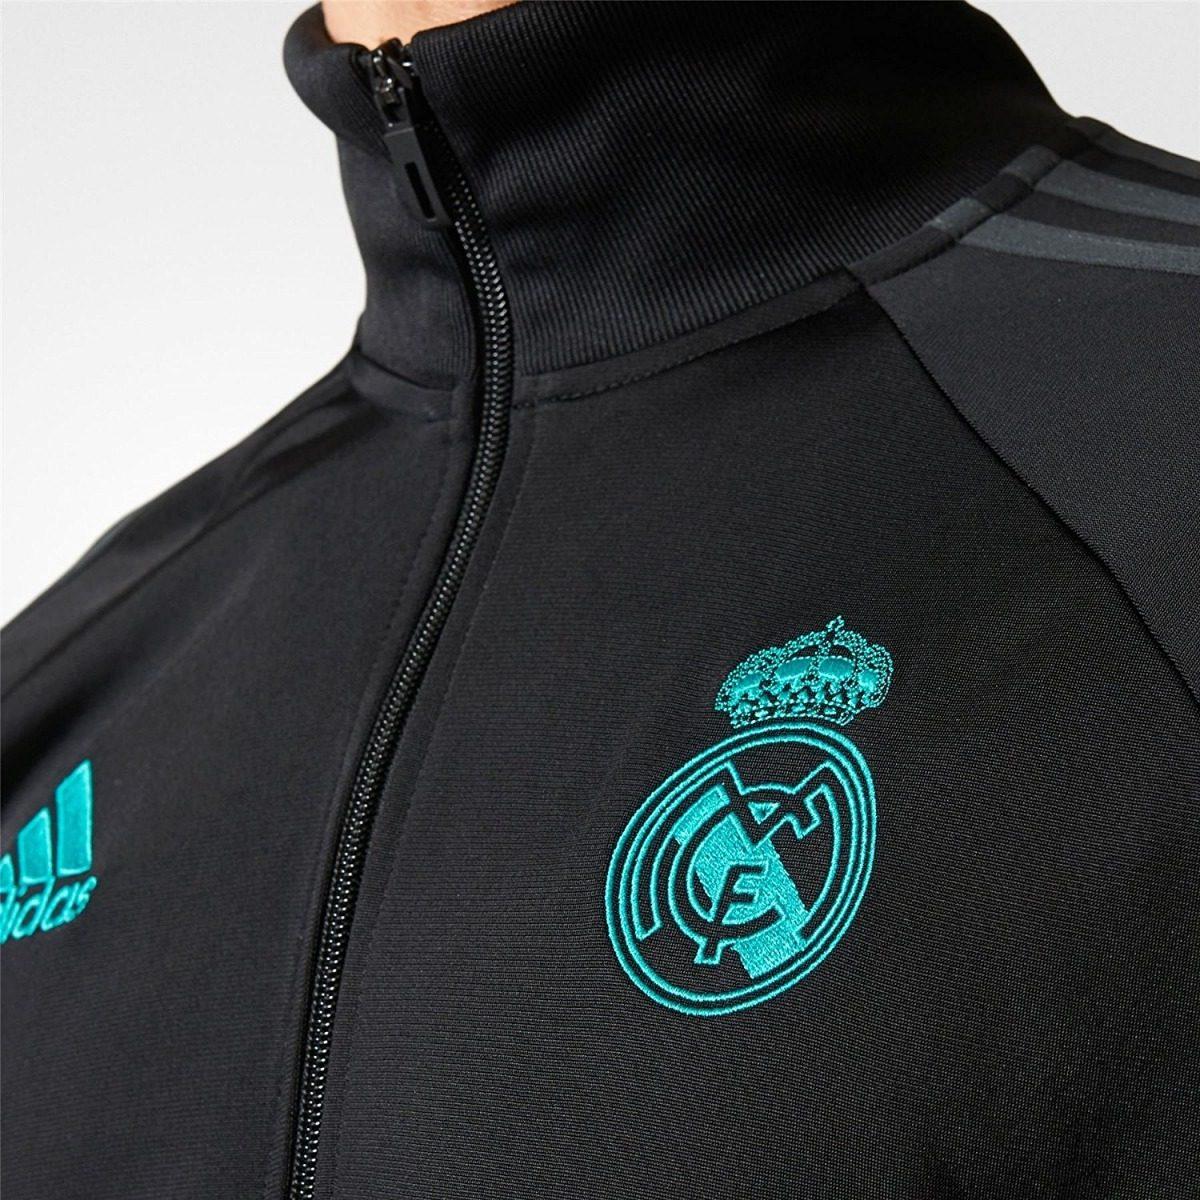 4d0435cb95c83 Conjunto Real Madrid Entrenamiento   Brand Sports -   2.650